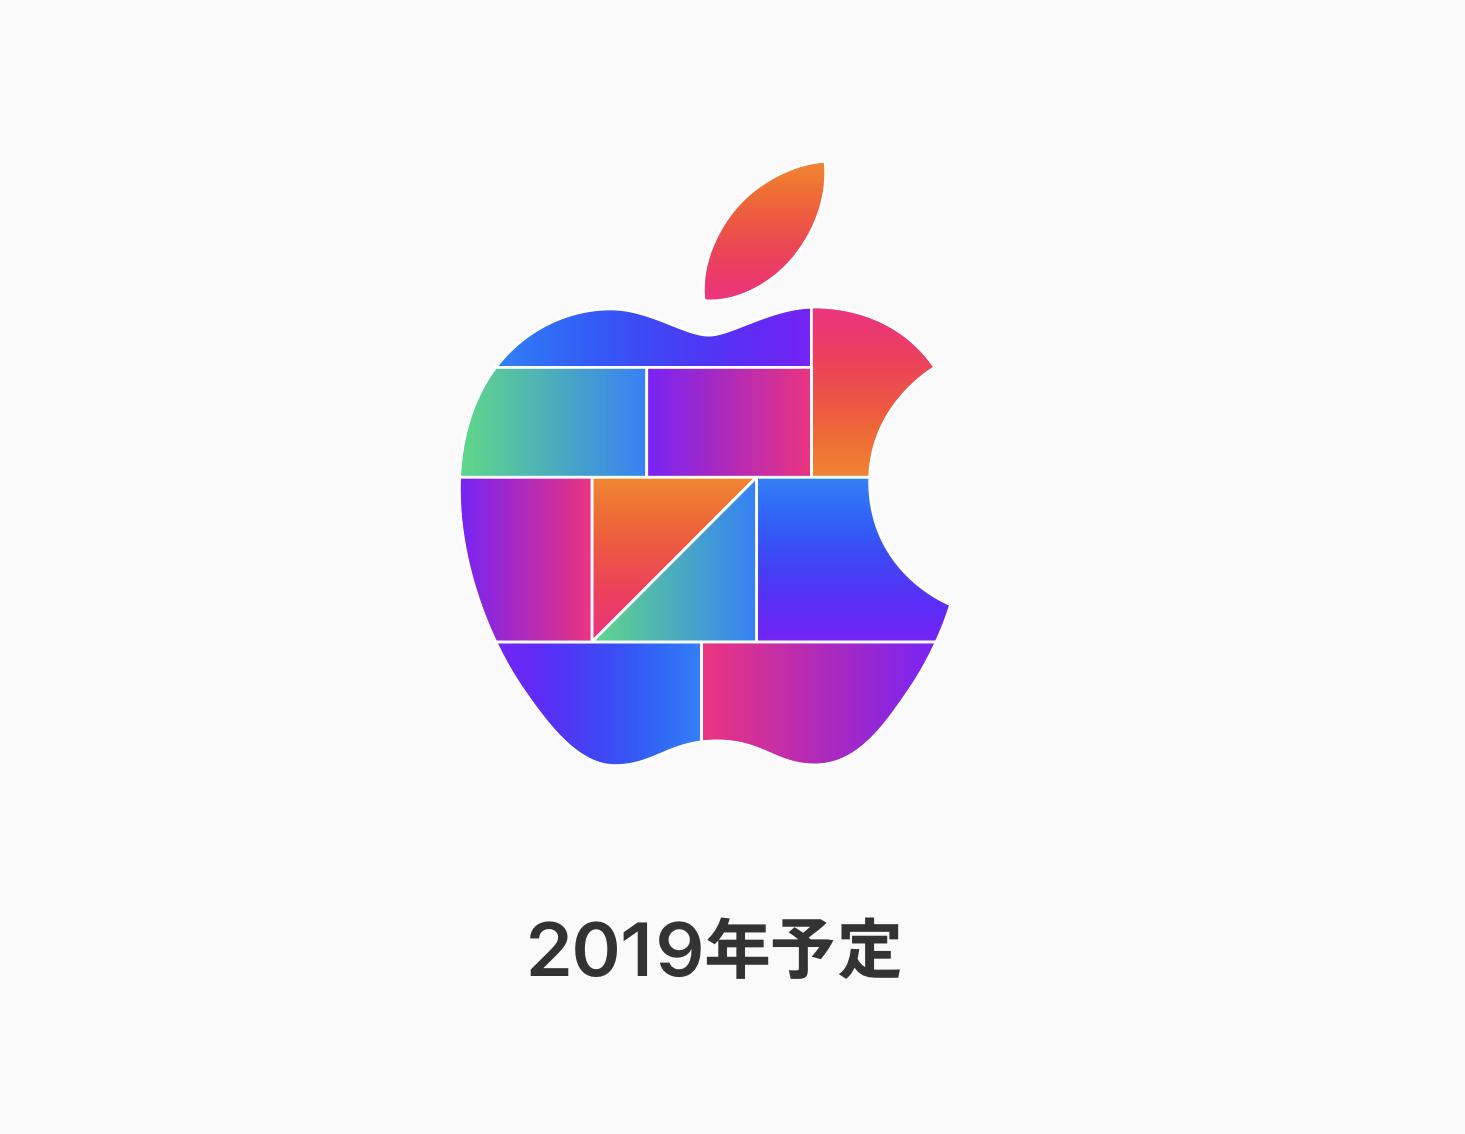 Apple Store 2019